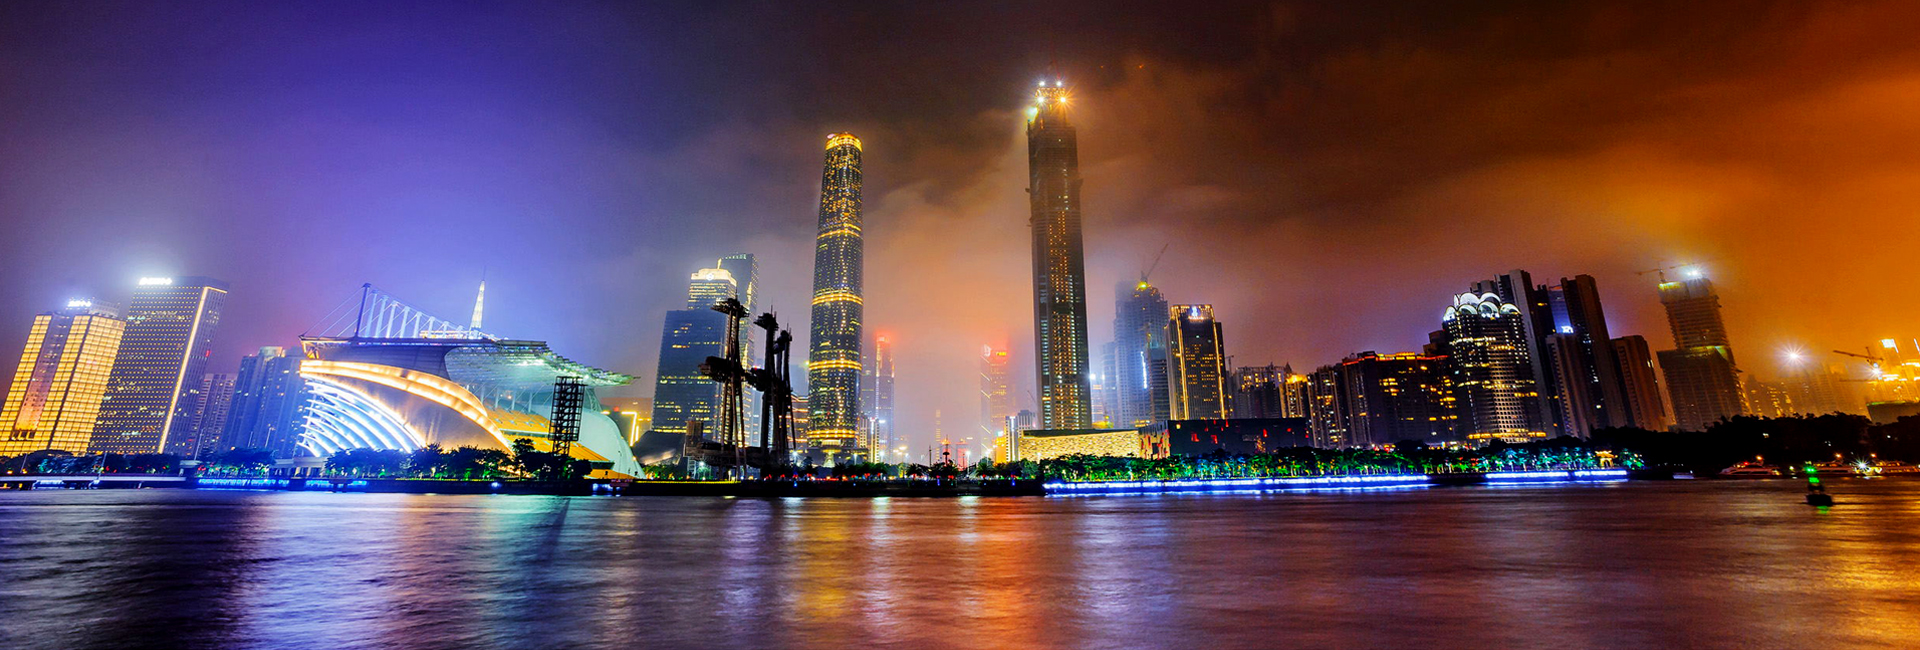 Río Perla de noche, Guangzhou